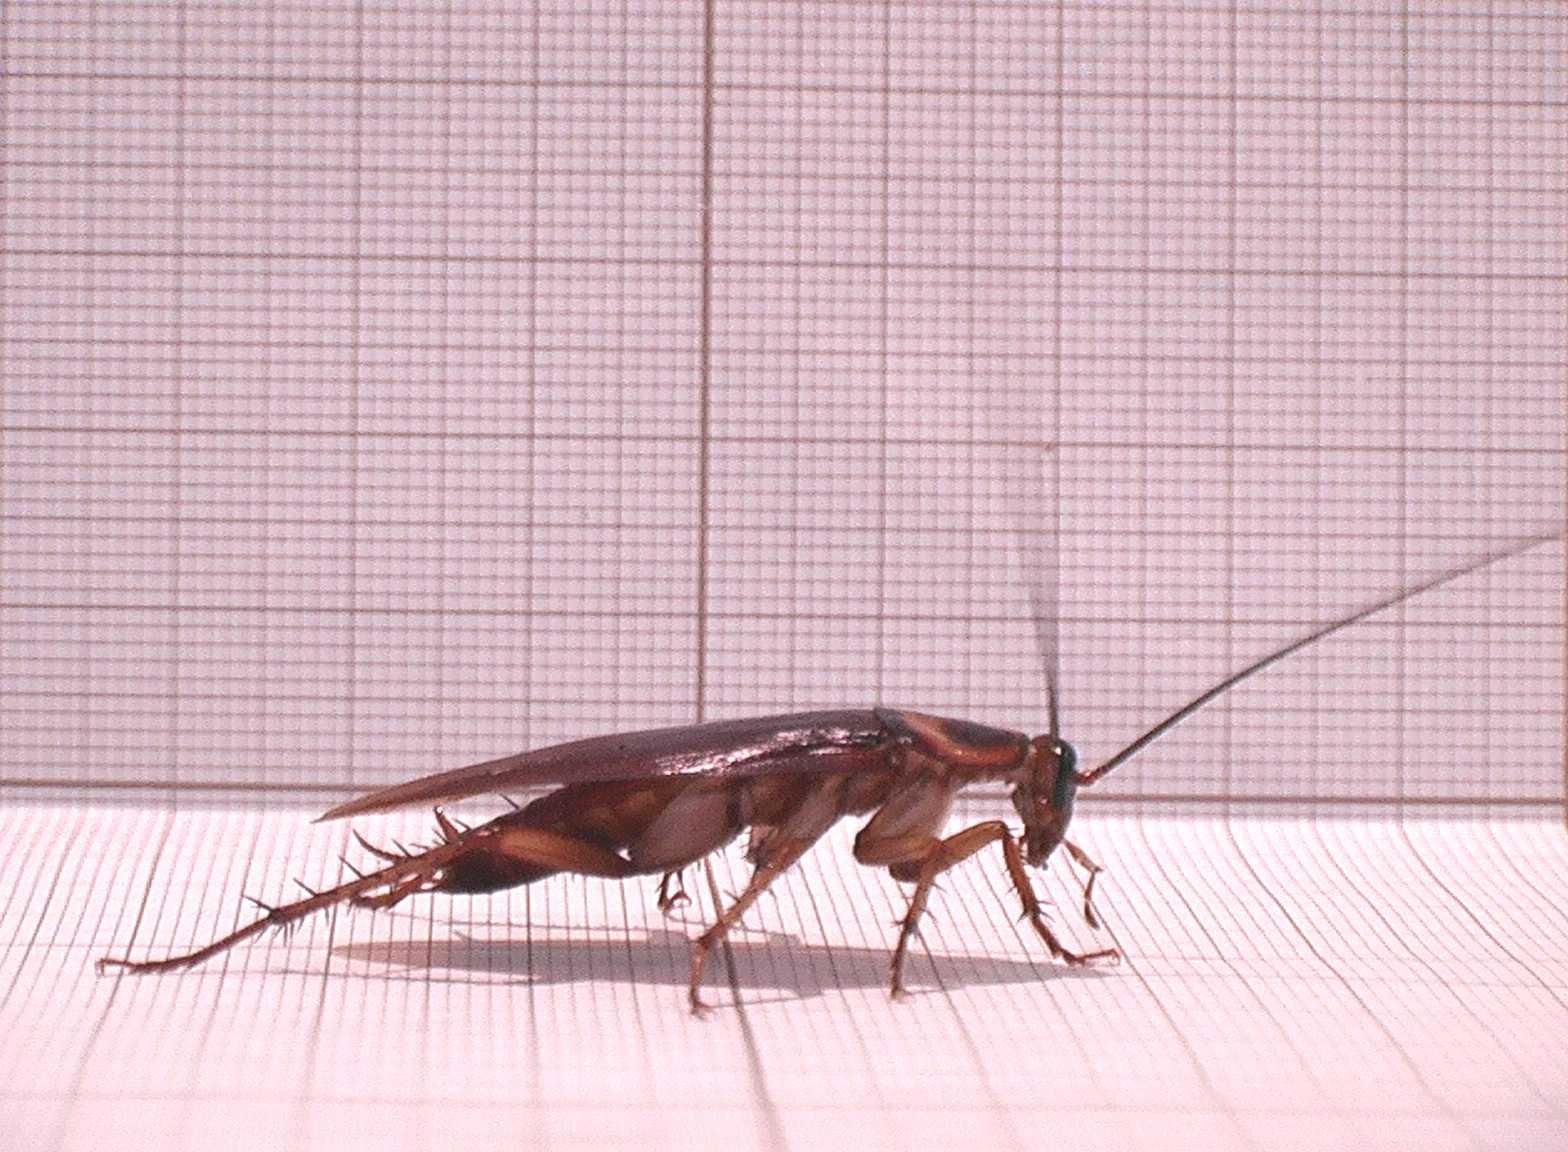 01-cockroach-cucaracha